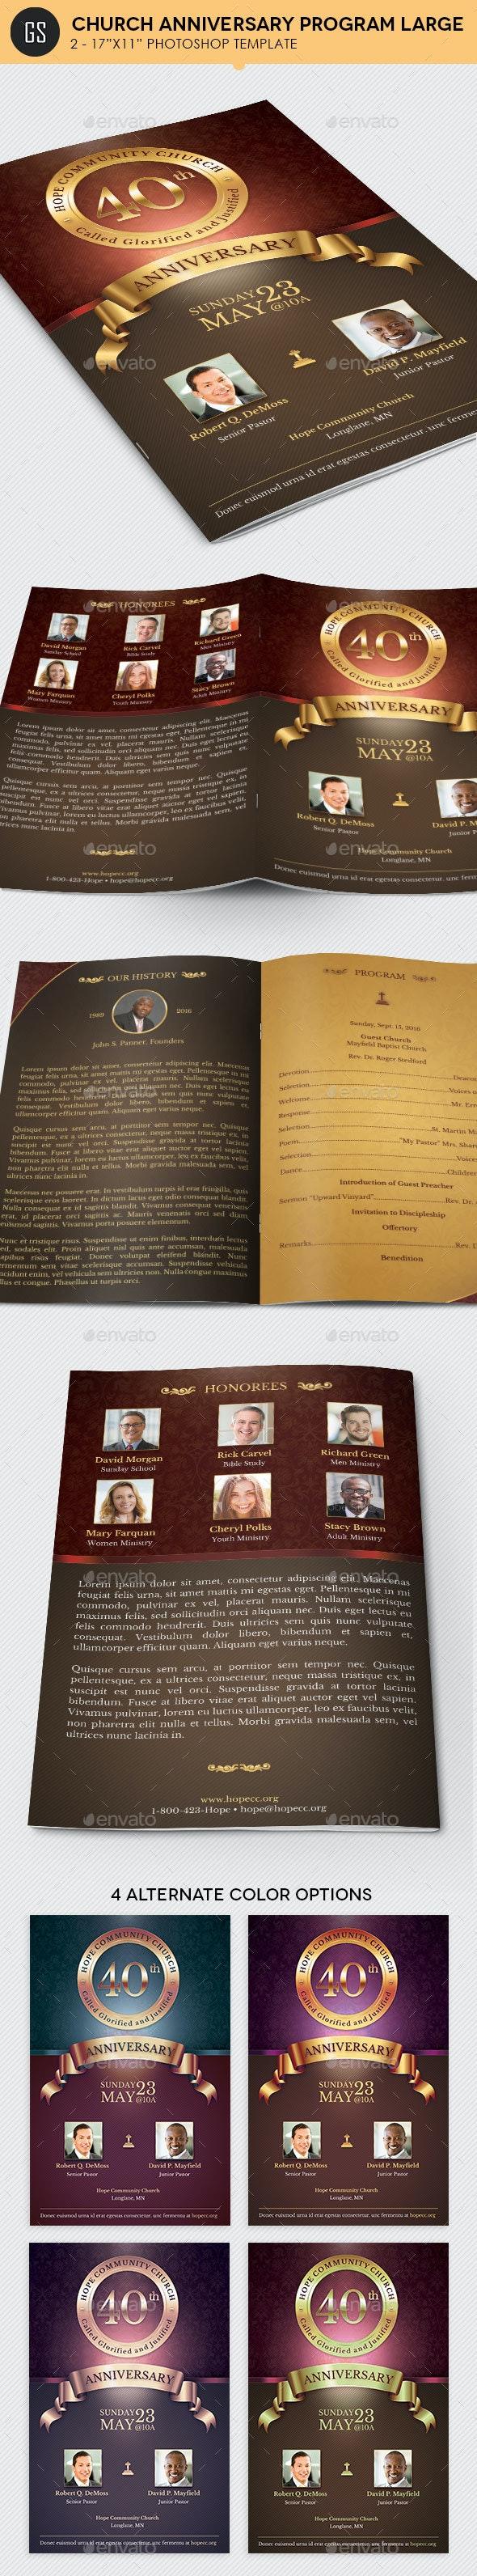 Church Anniversary Program Large Template - Informational Brochures